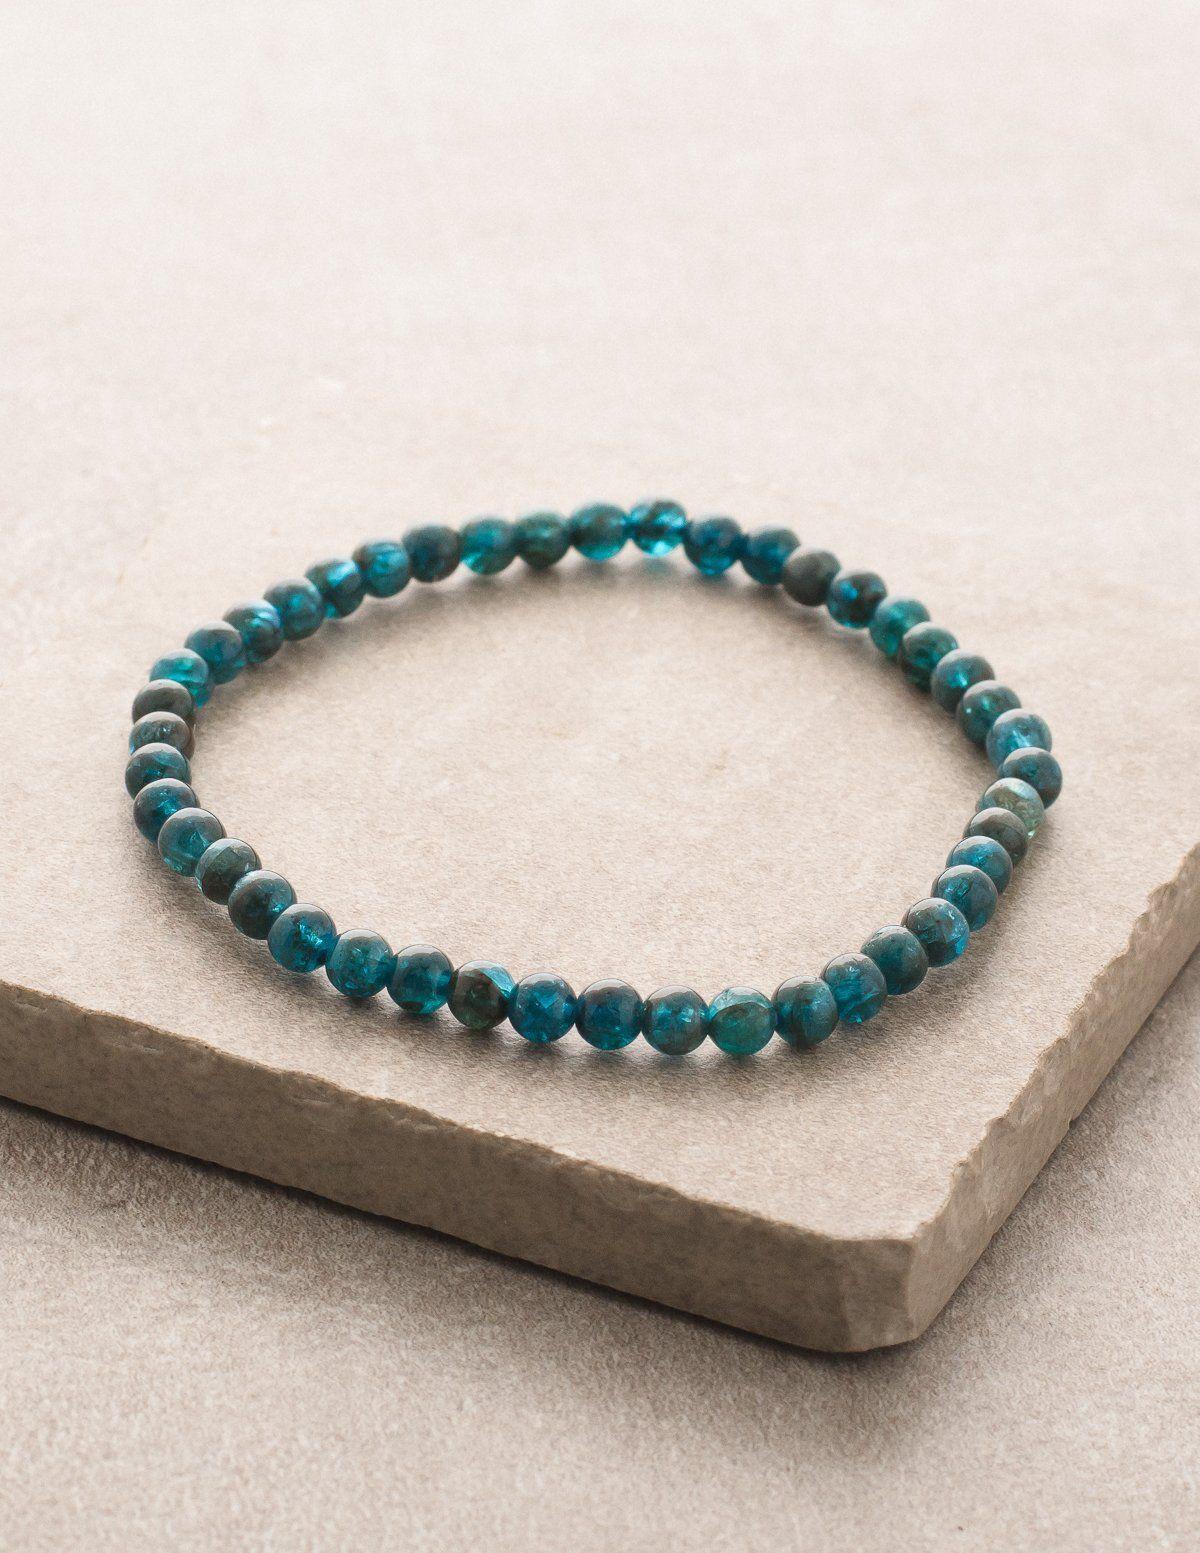 Apatite Mini Energy Gemstone Bracelet Gemstones Energy Energy Bracelets Bracelets